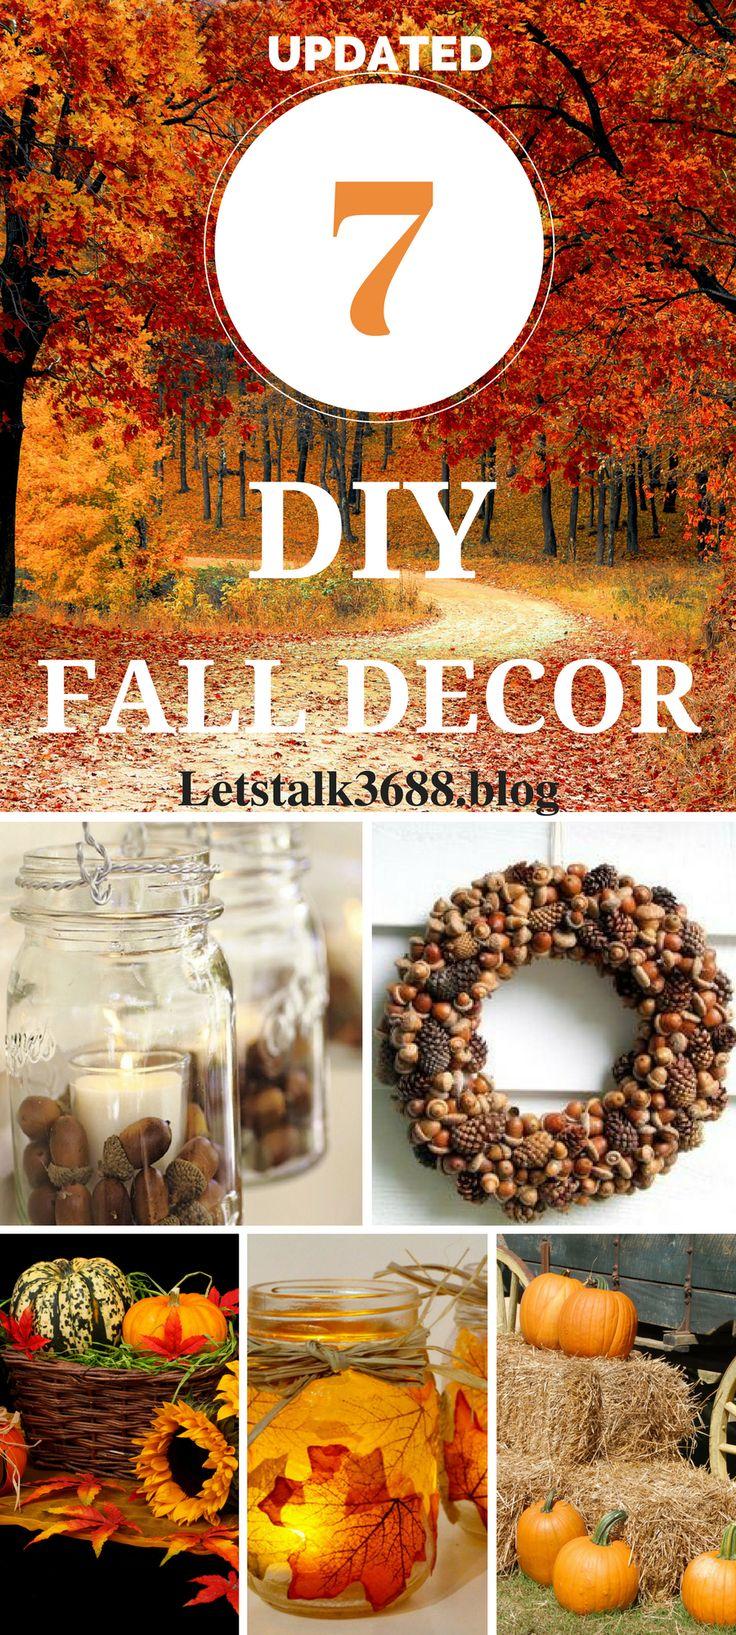 DIY fall decor ideas for the porch. Fall decor ideas for homes. Dollar tree fall decor ideas.